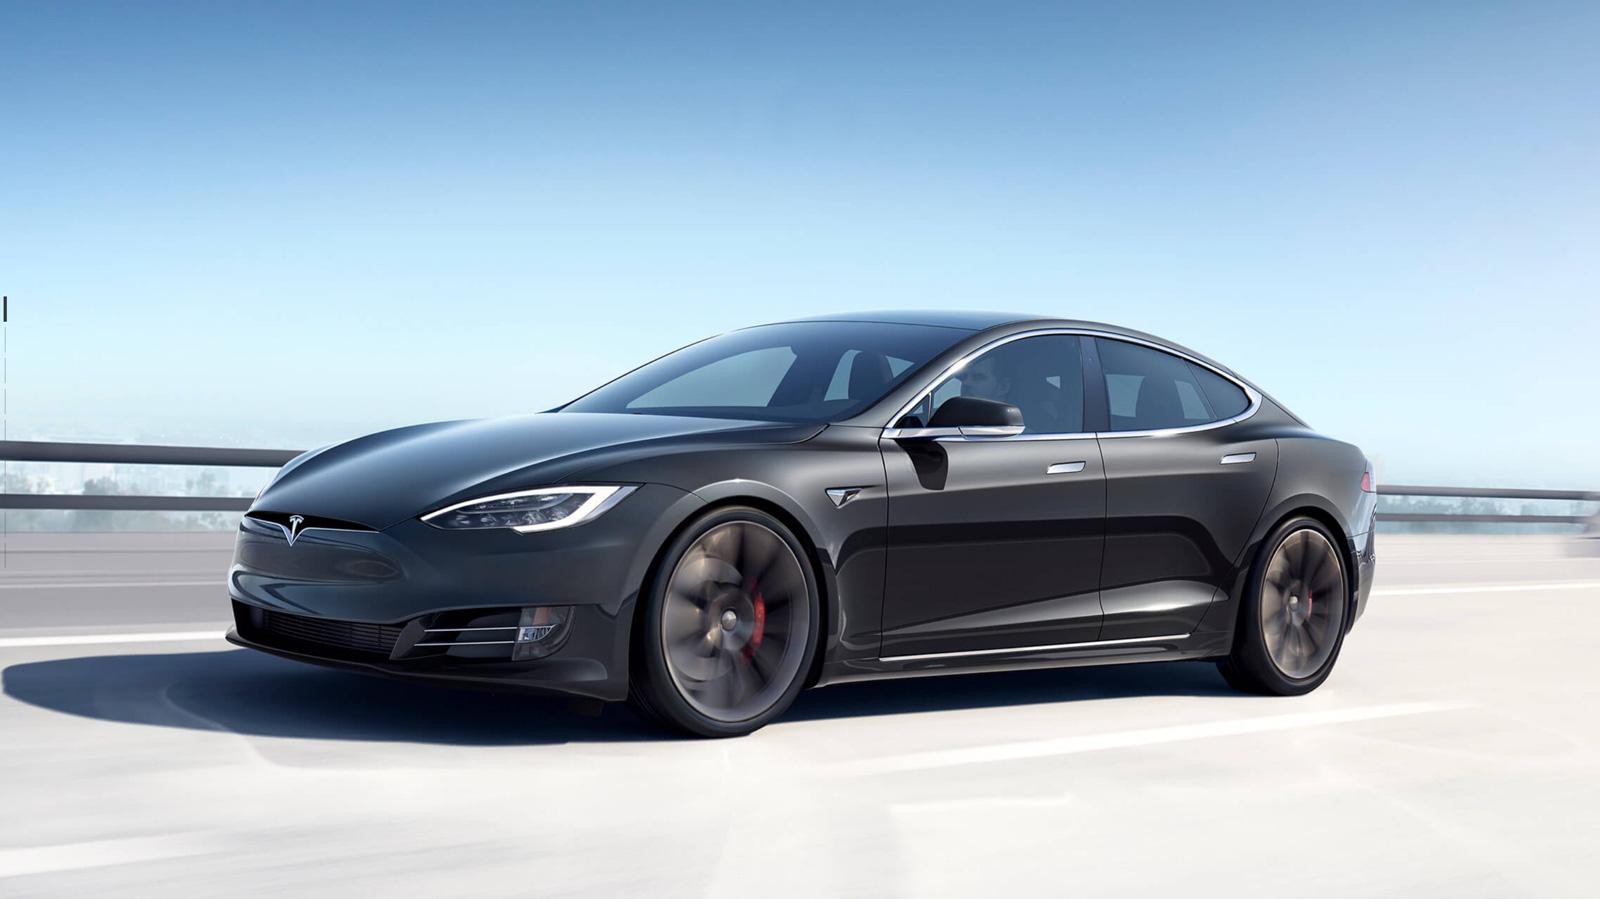 Tesla Modell S – Maximale Reichweite